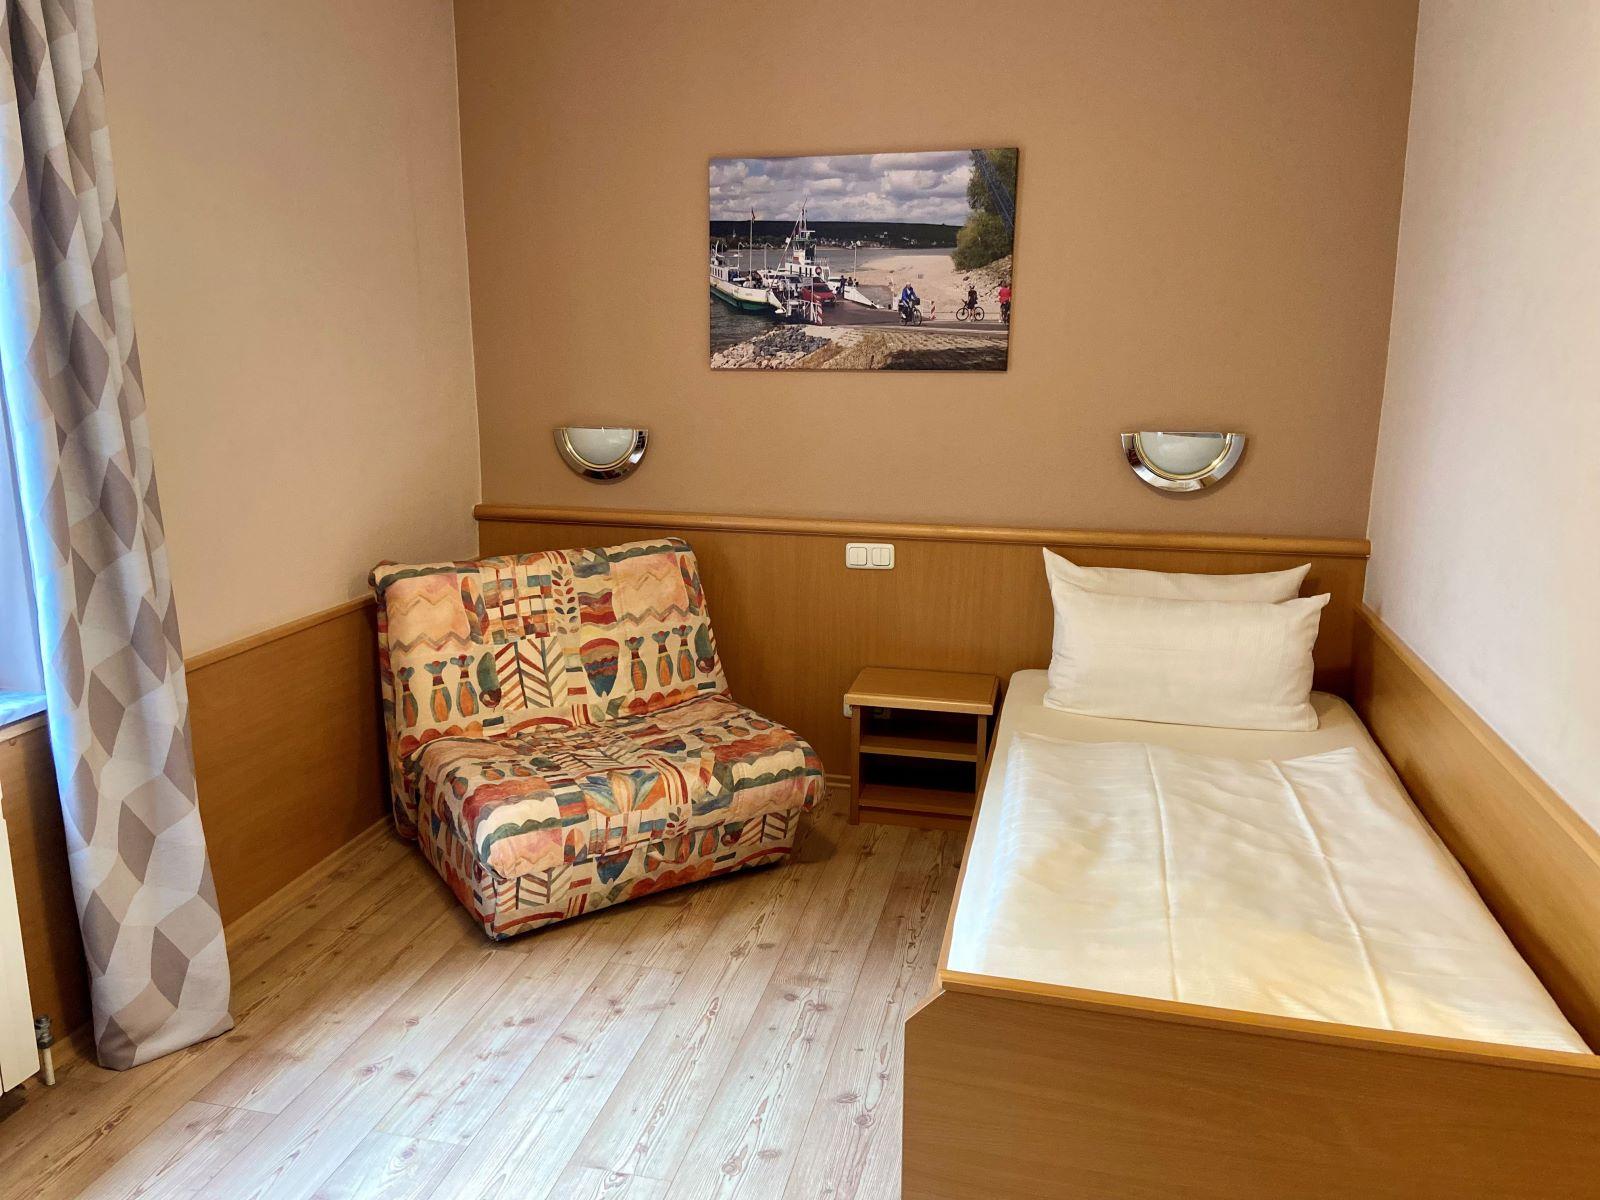 einzelzimmer-guenstig-buchen-behindertengerecht-riedstadt